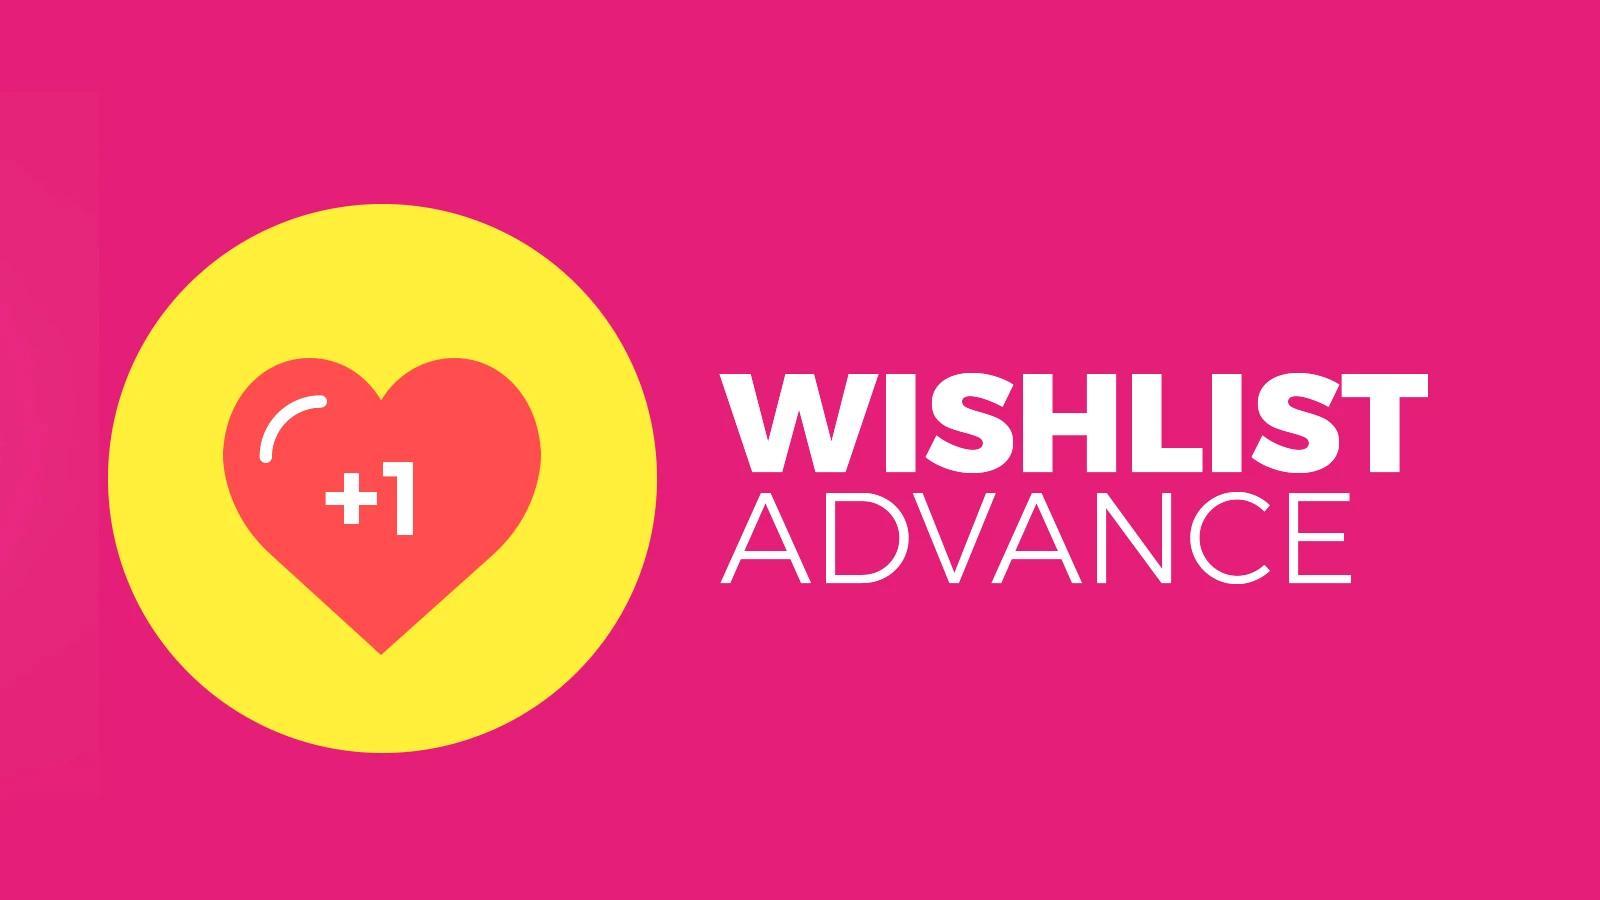 wishlist advance